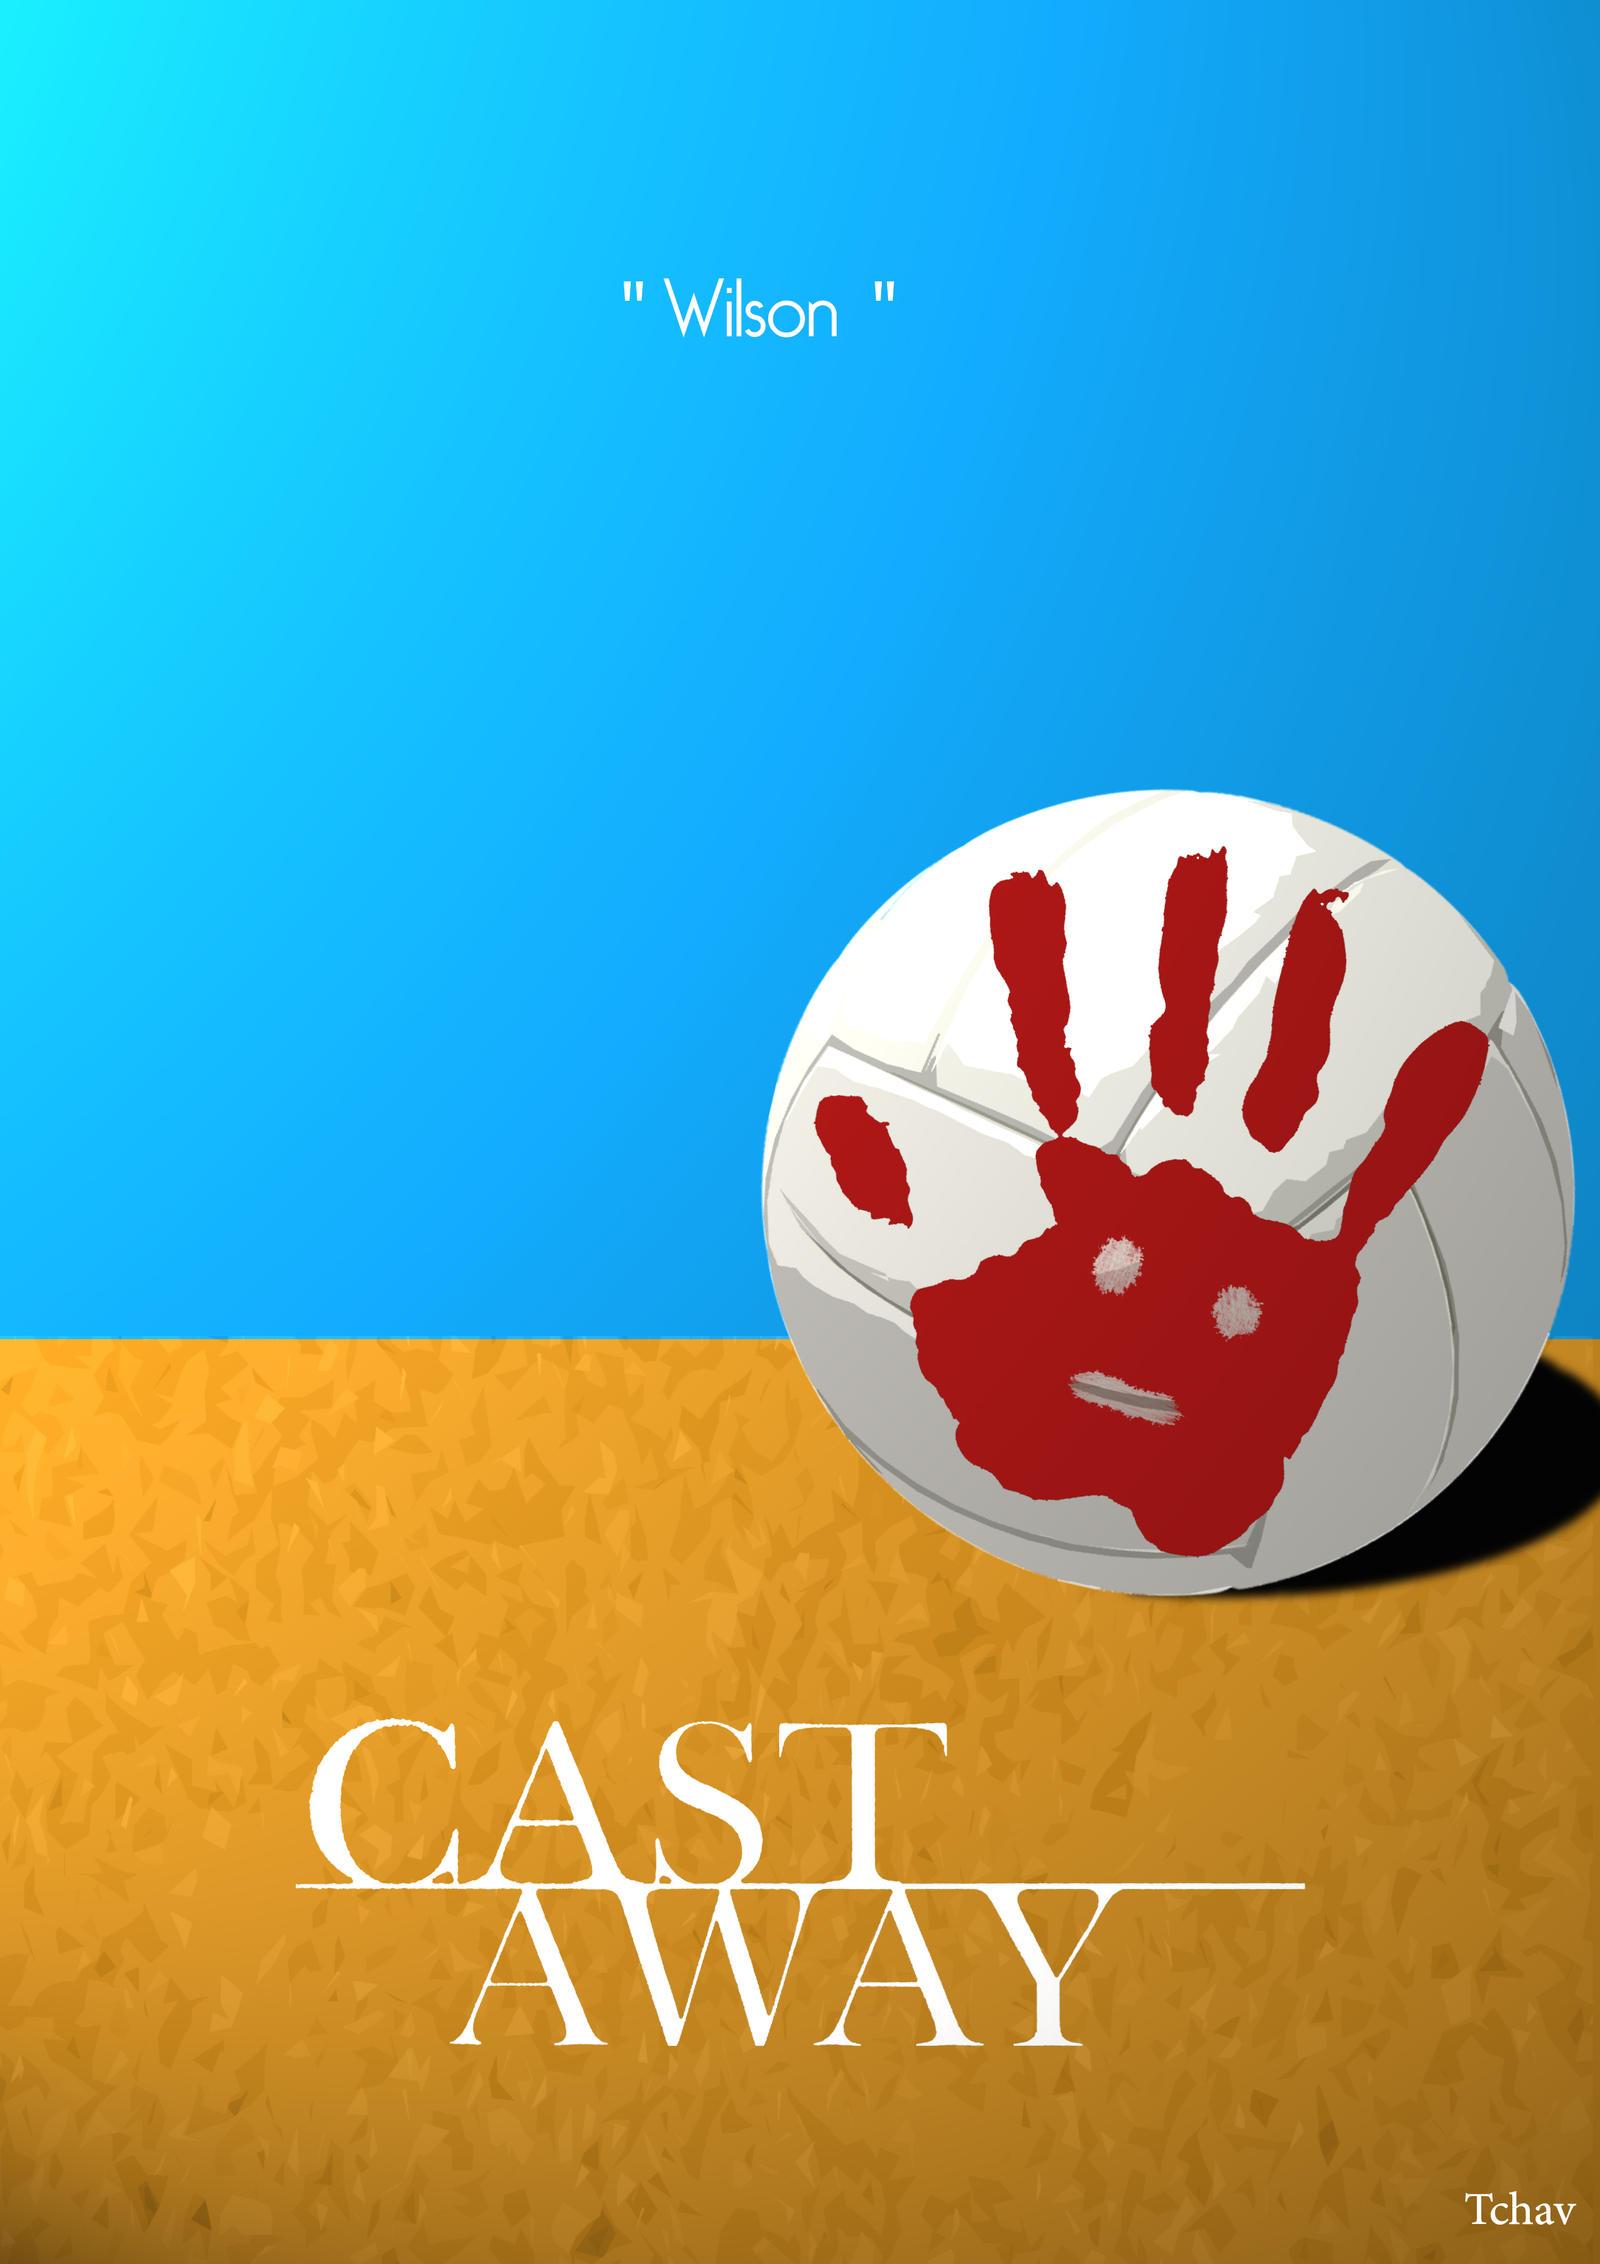 Cast away minimalist poster by tchav on deviantart for Art post minimalisme